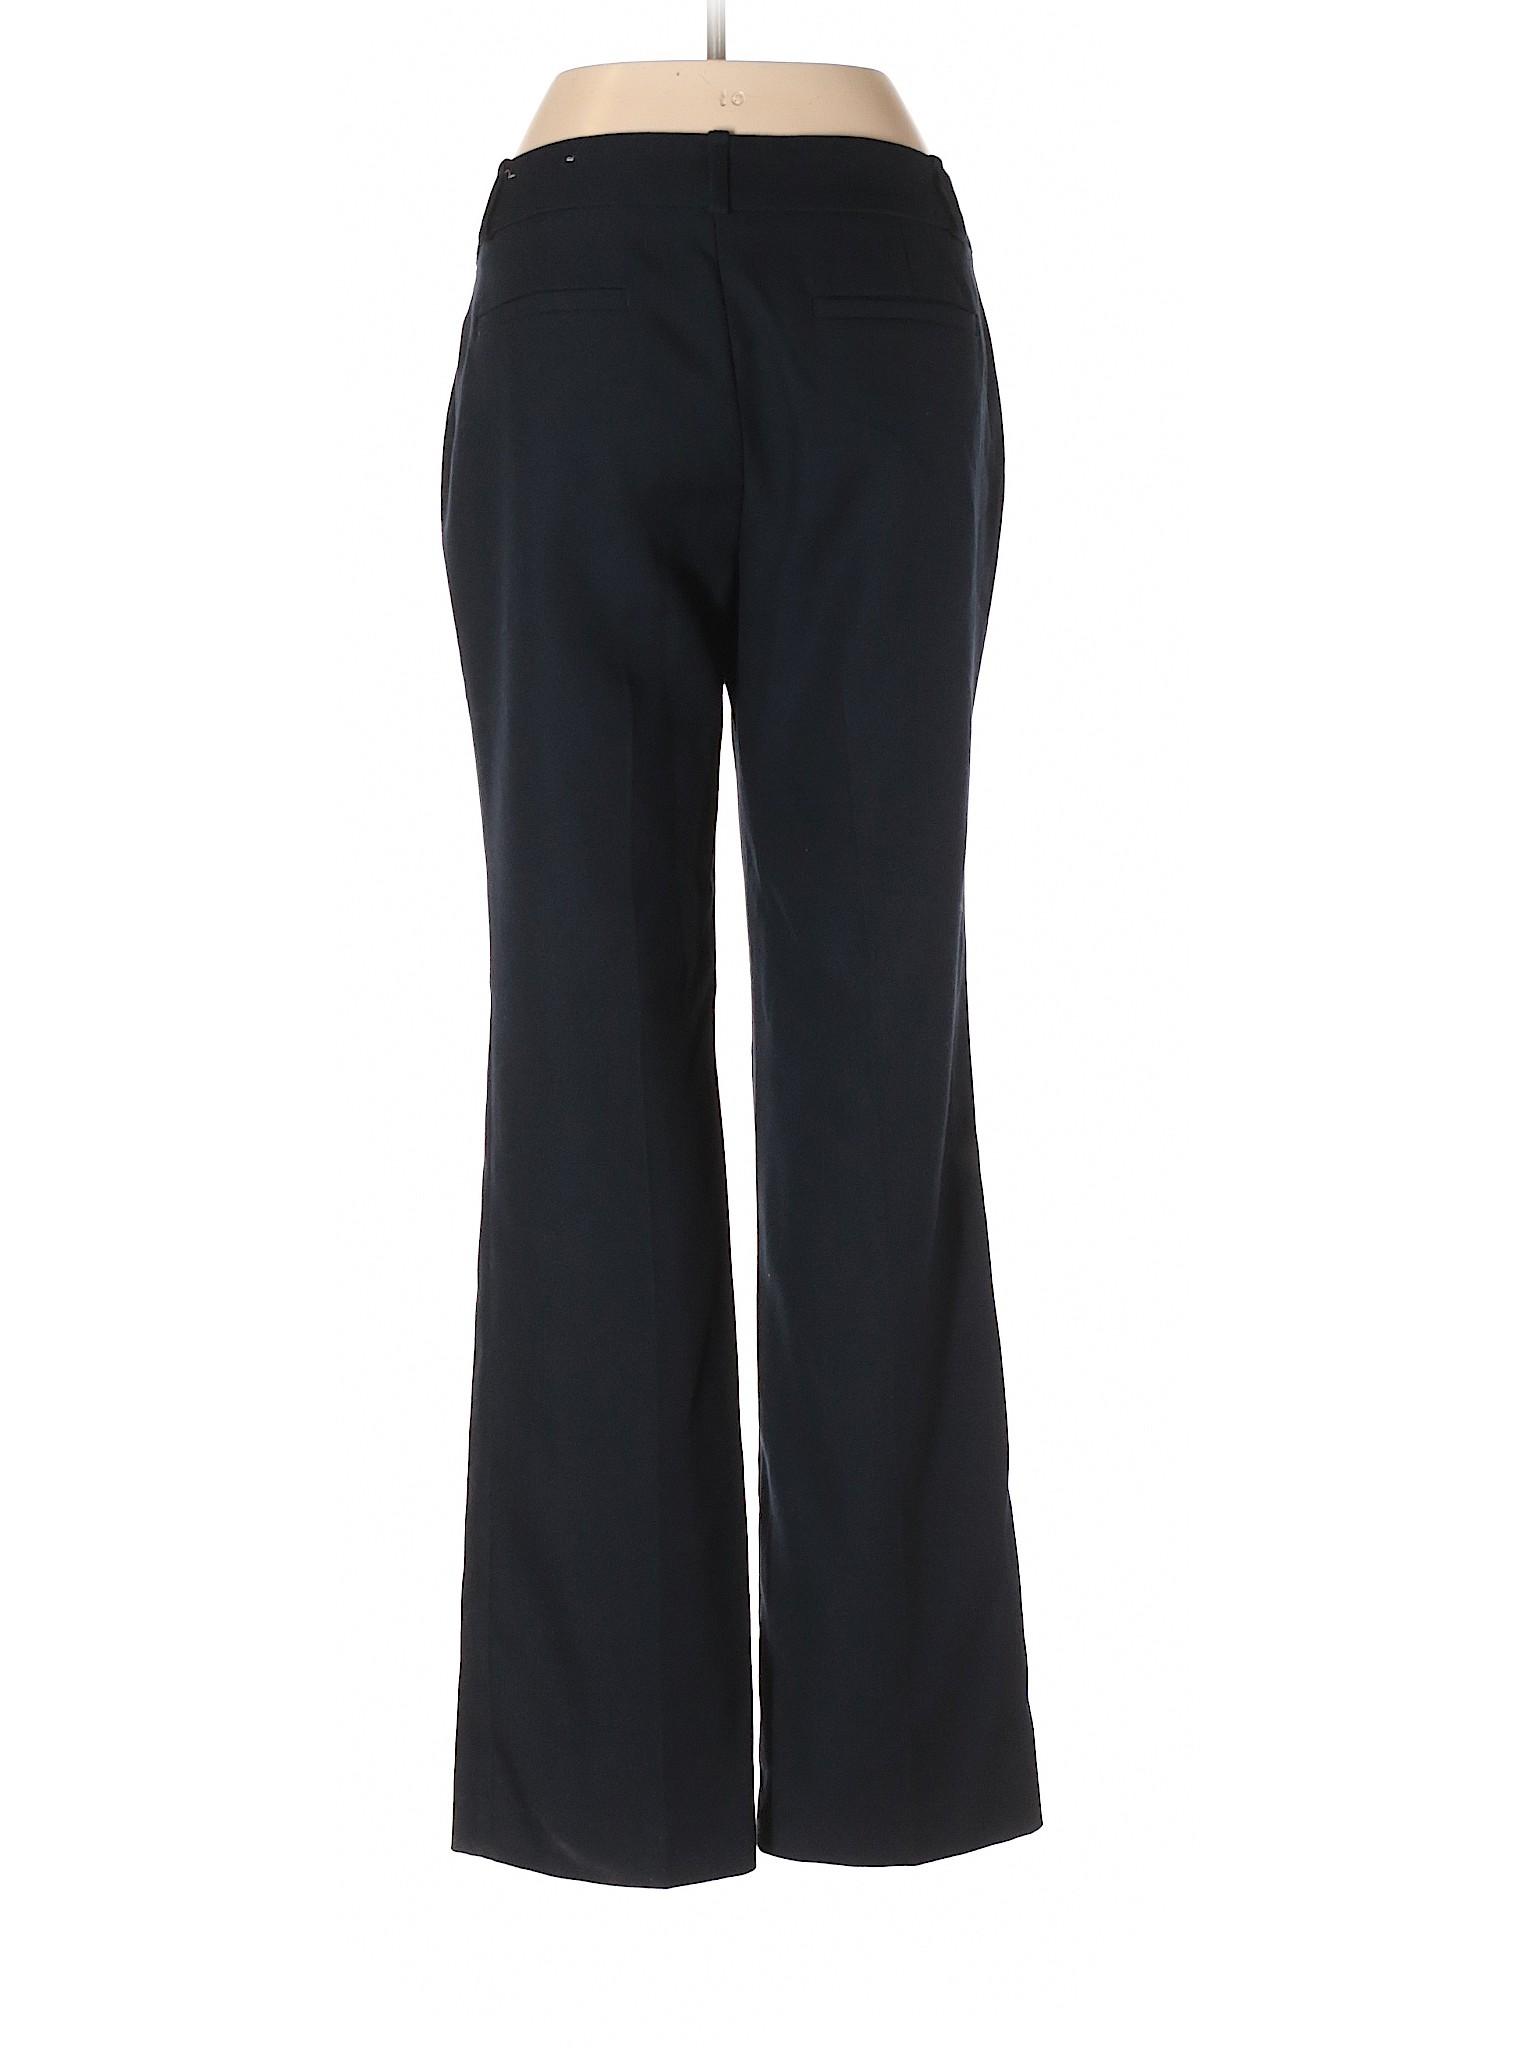 Casual LOFT Pants Taylor winter Ann Boutique IqZwFOAW